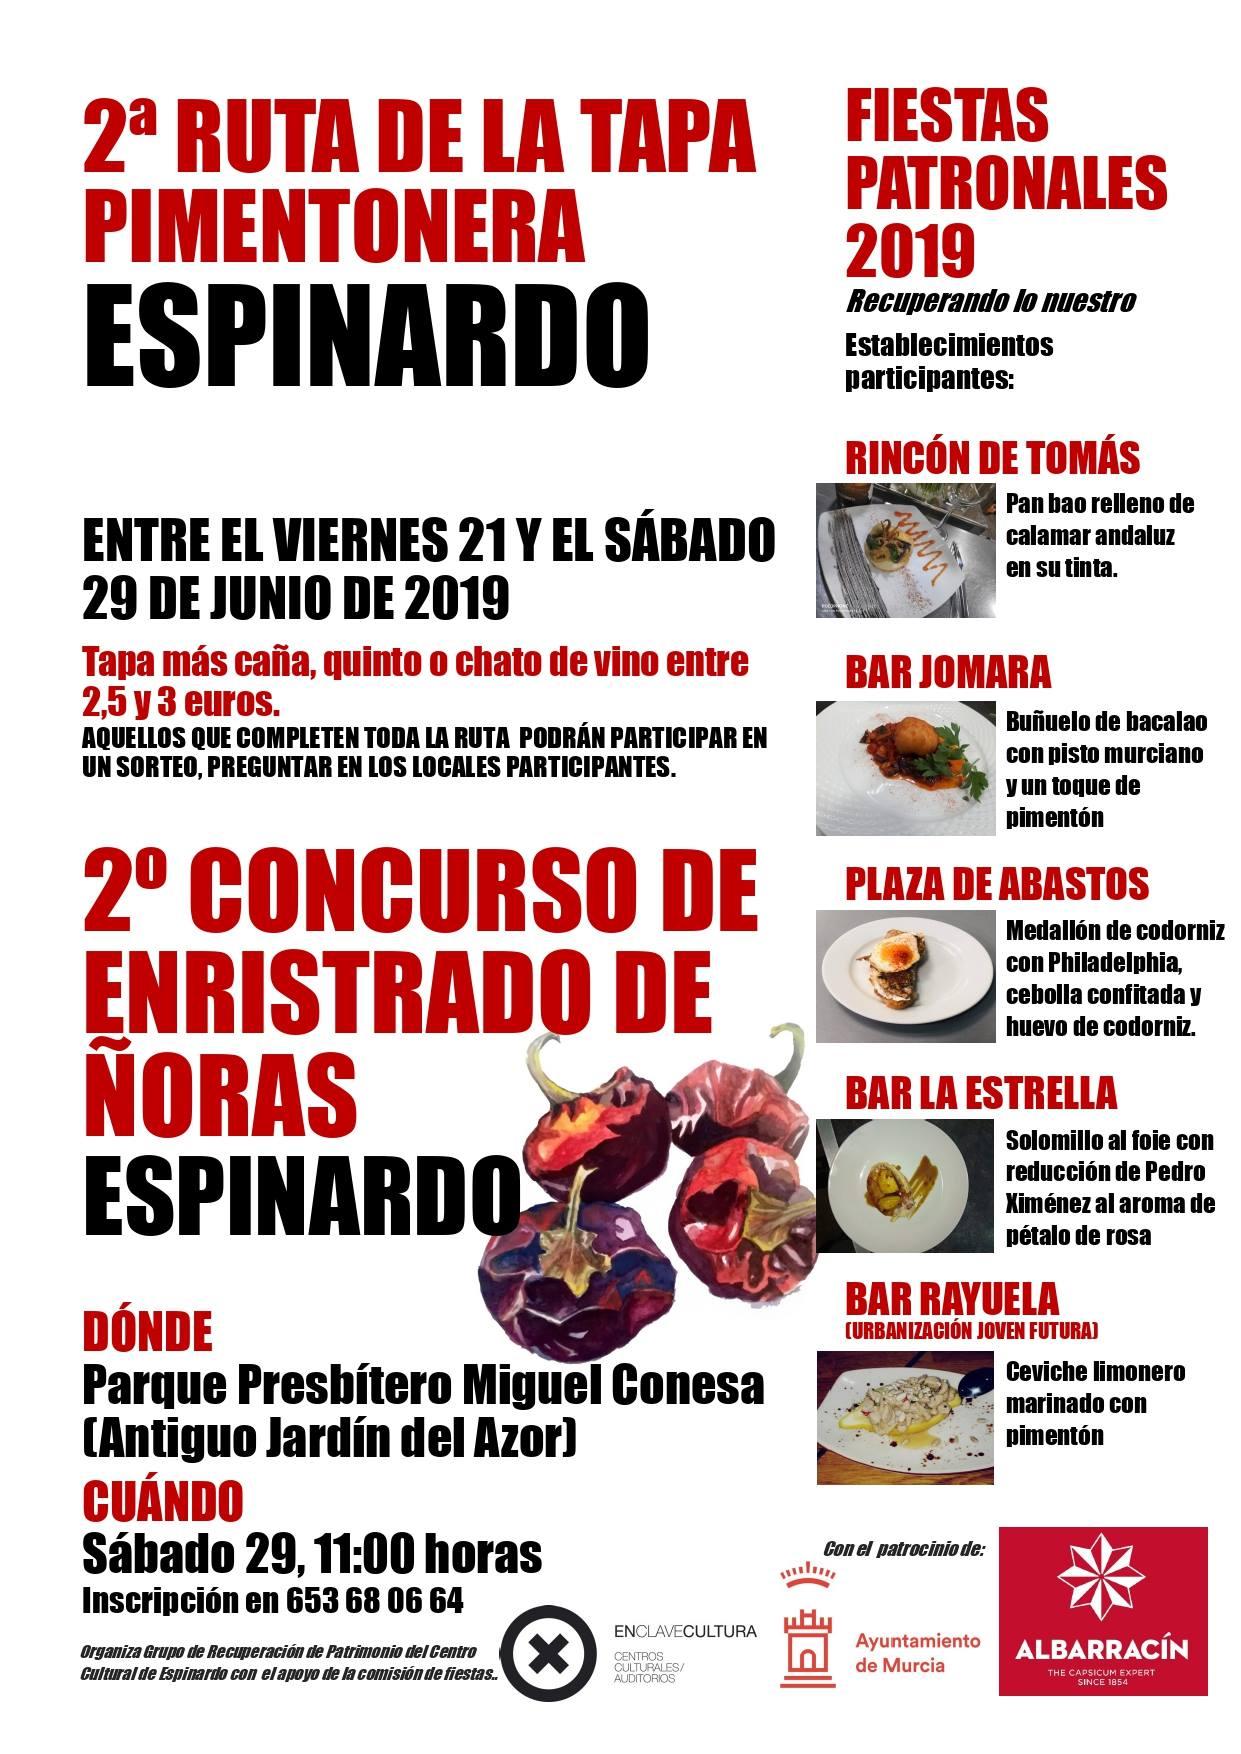 Cartel 2 ruta de la tapa pimentonera en Espinardo